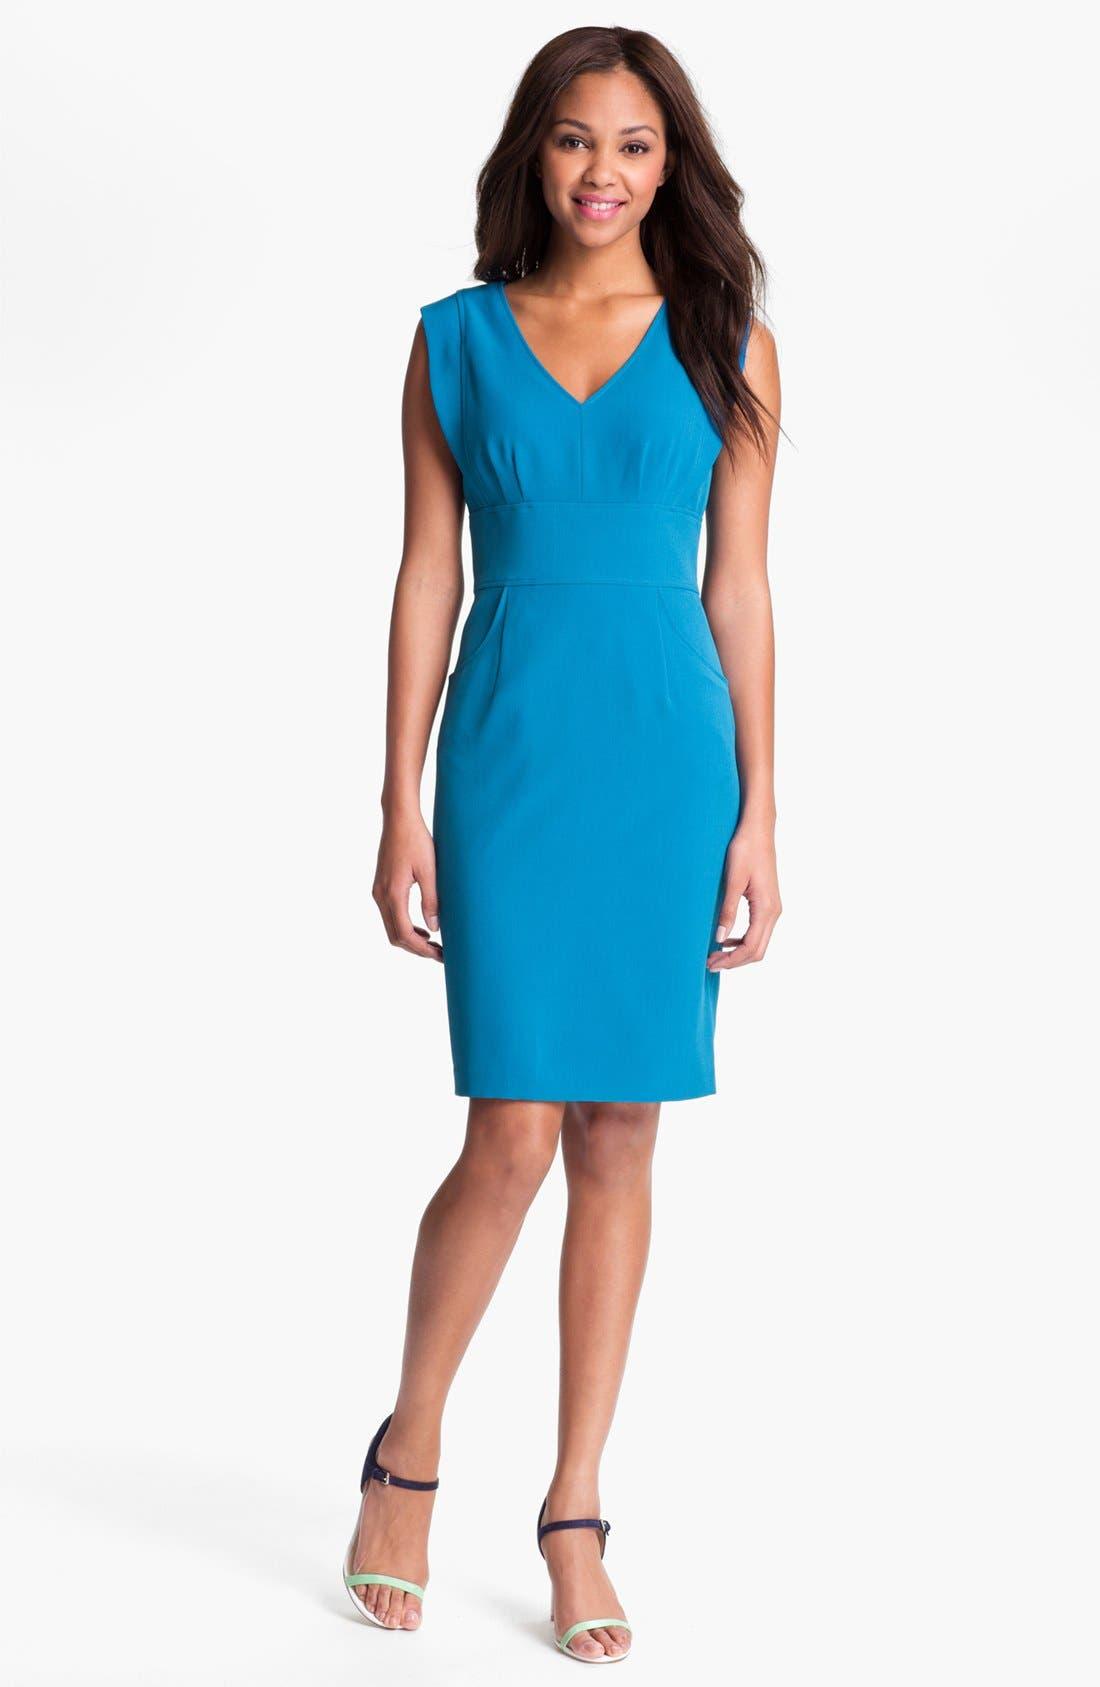 Alternate Image 1 Selected - Adrianna Papell V-Neck Sheath Dress (Petite)